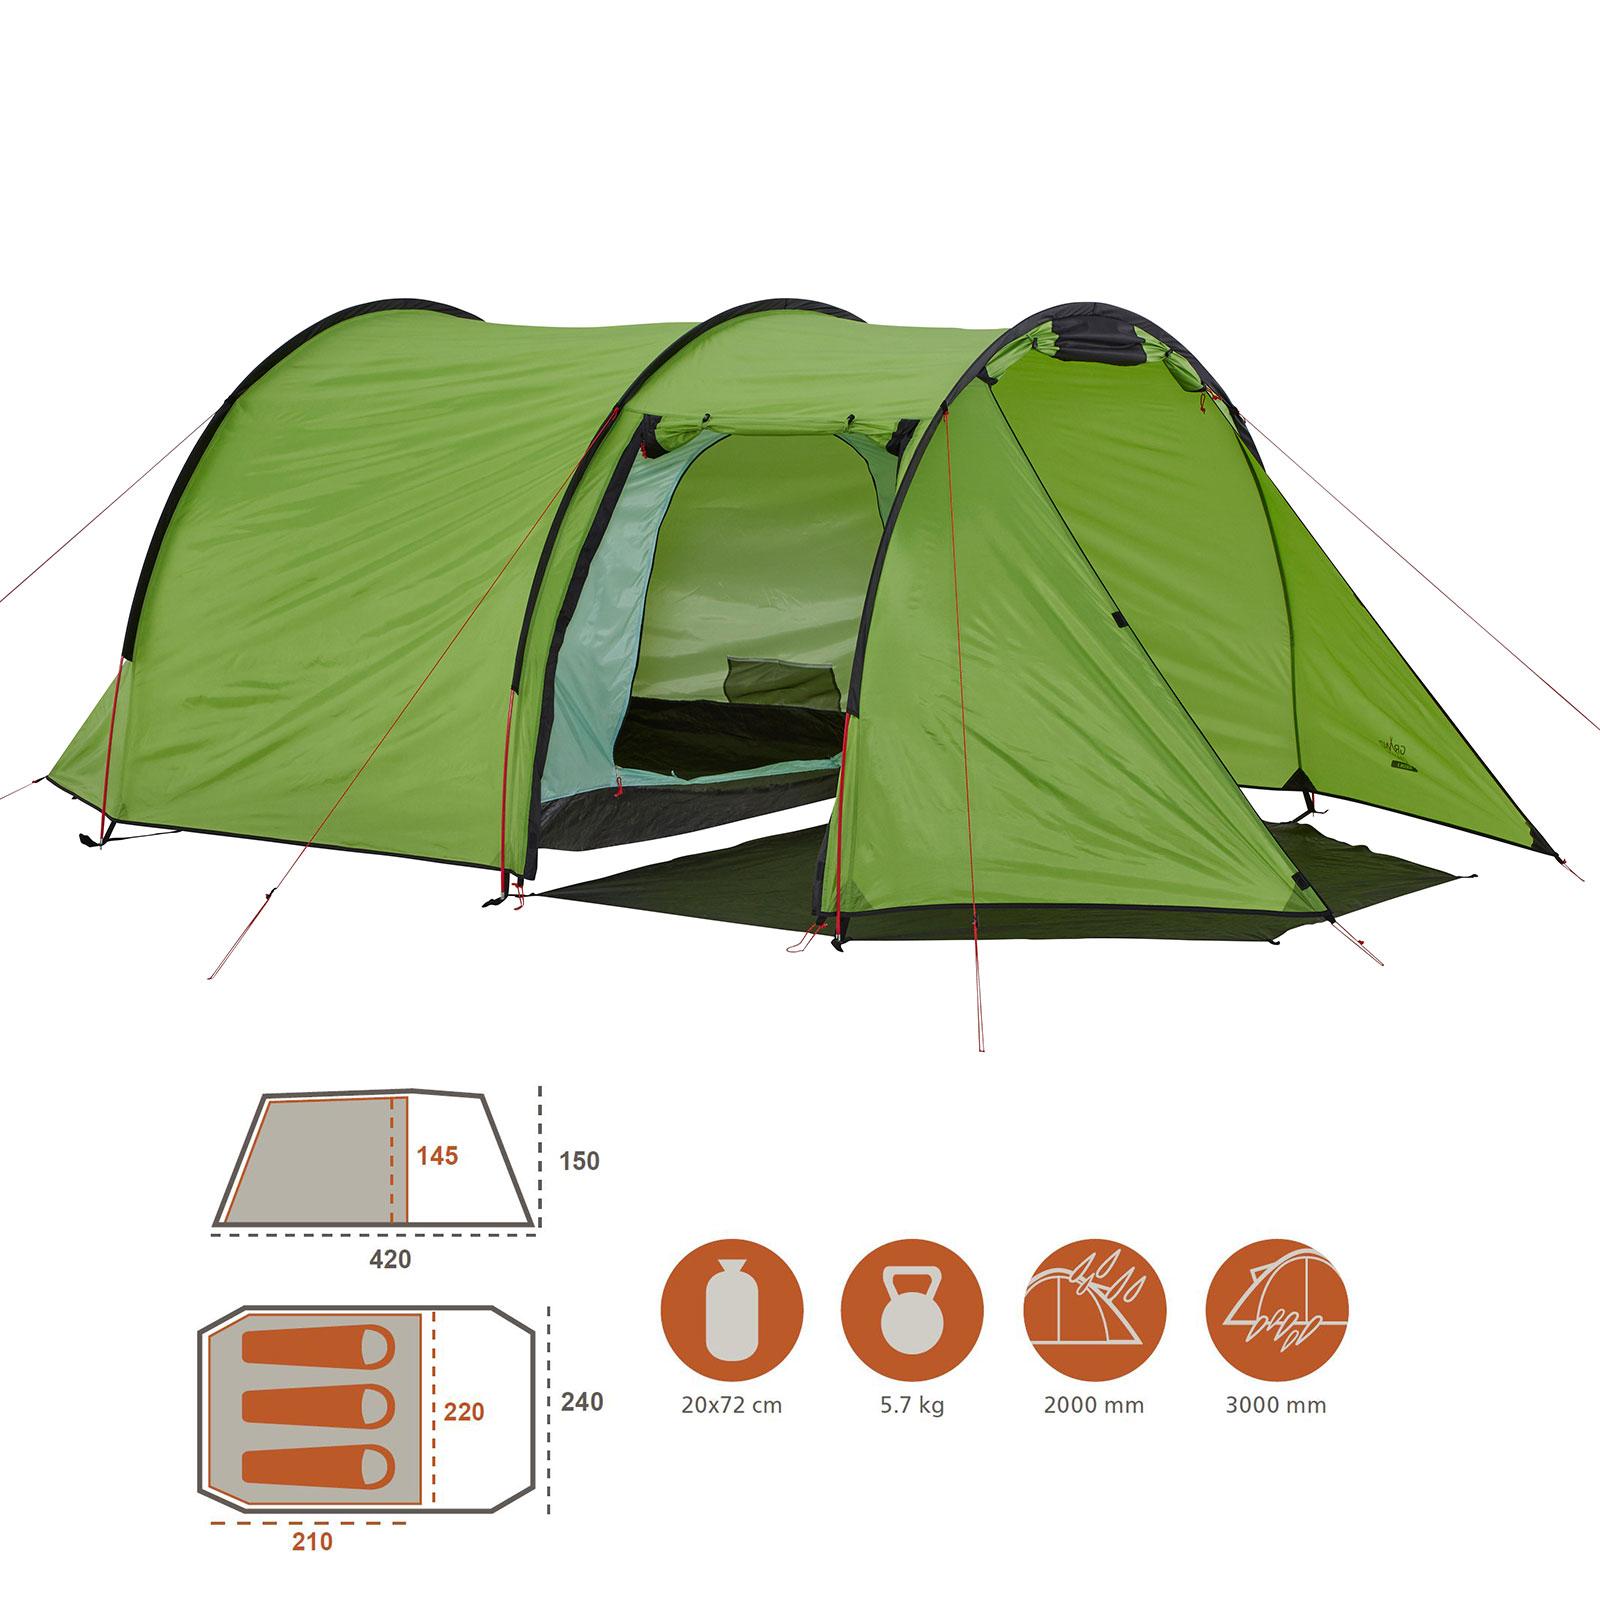 Grand Canyon Tente Cardova-einbogenzelt pour 1-2 personnes